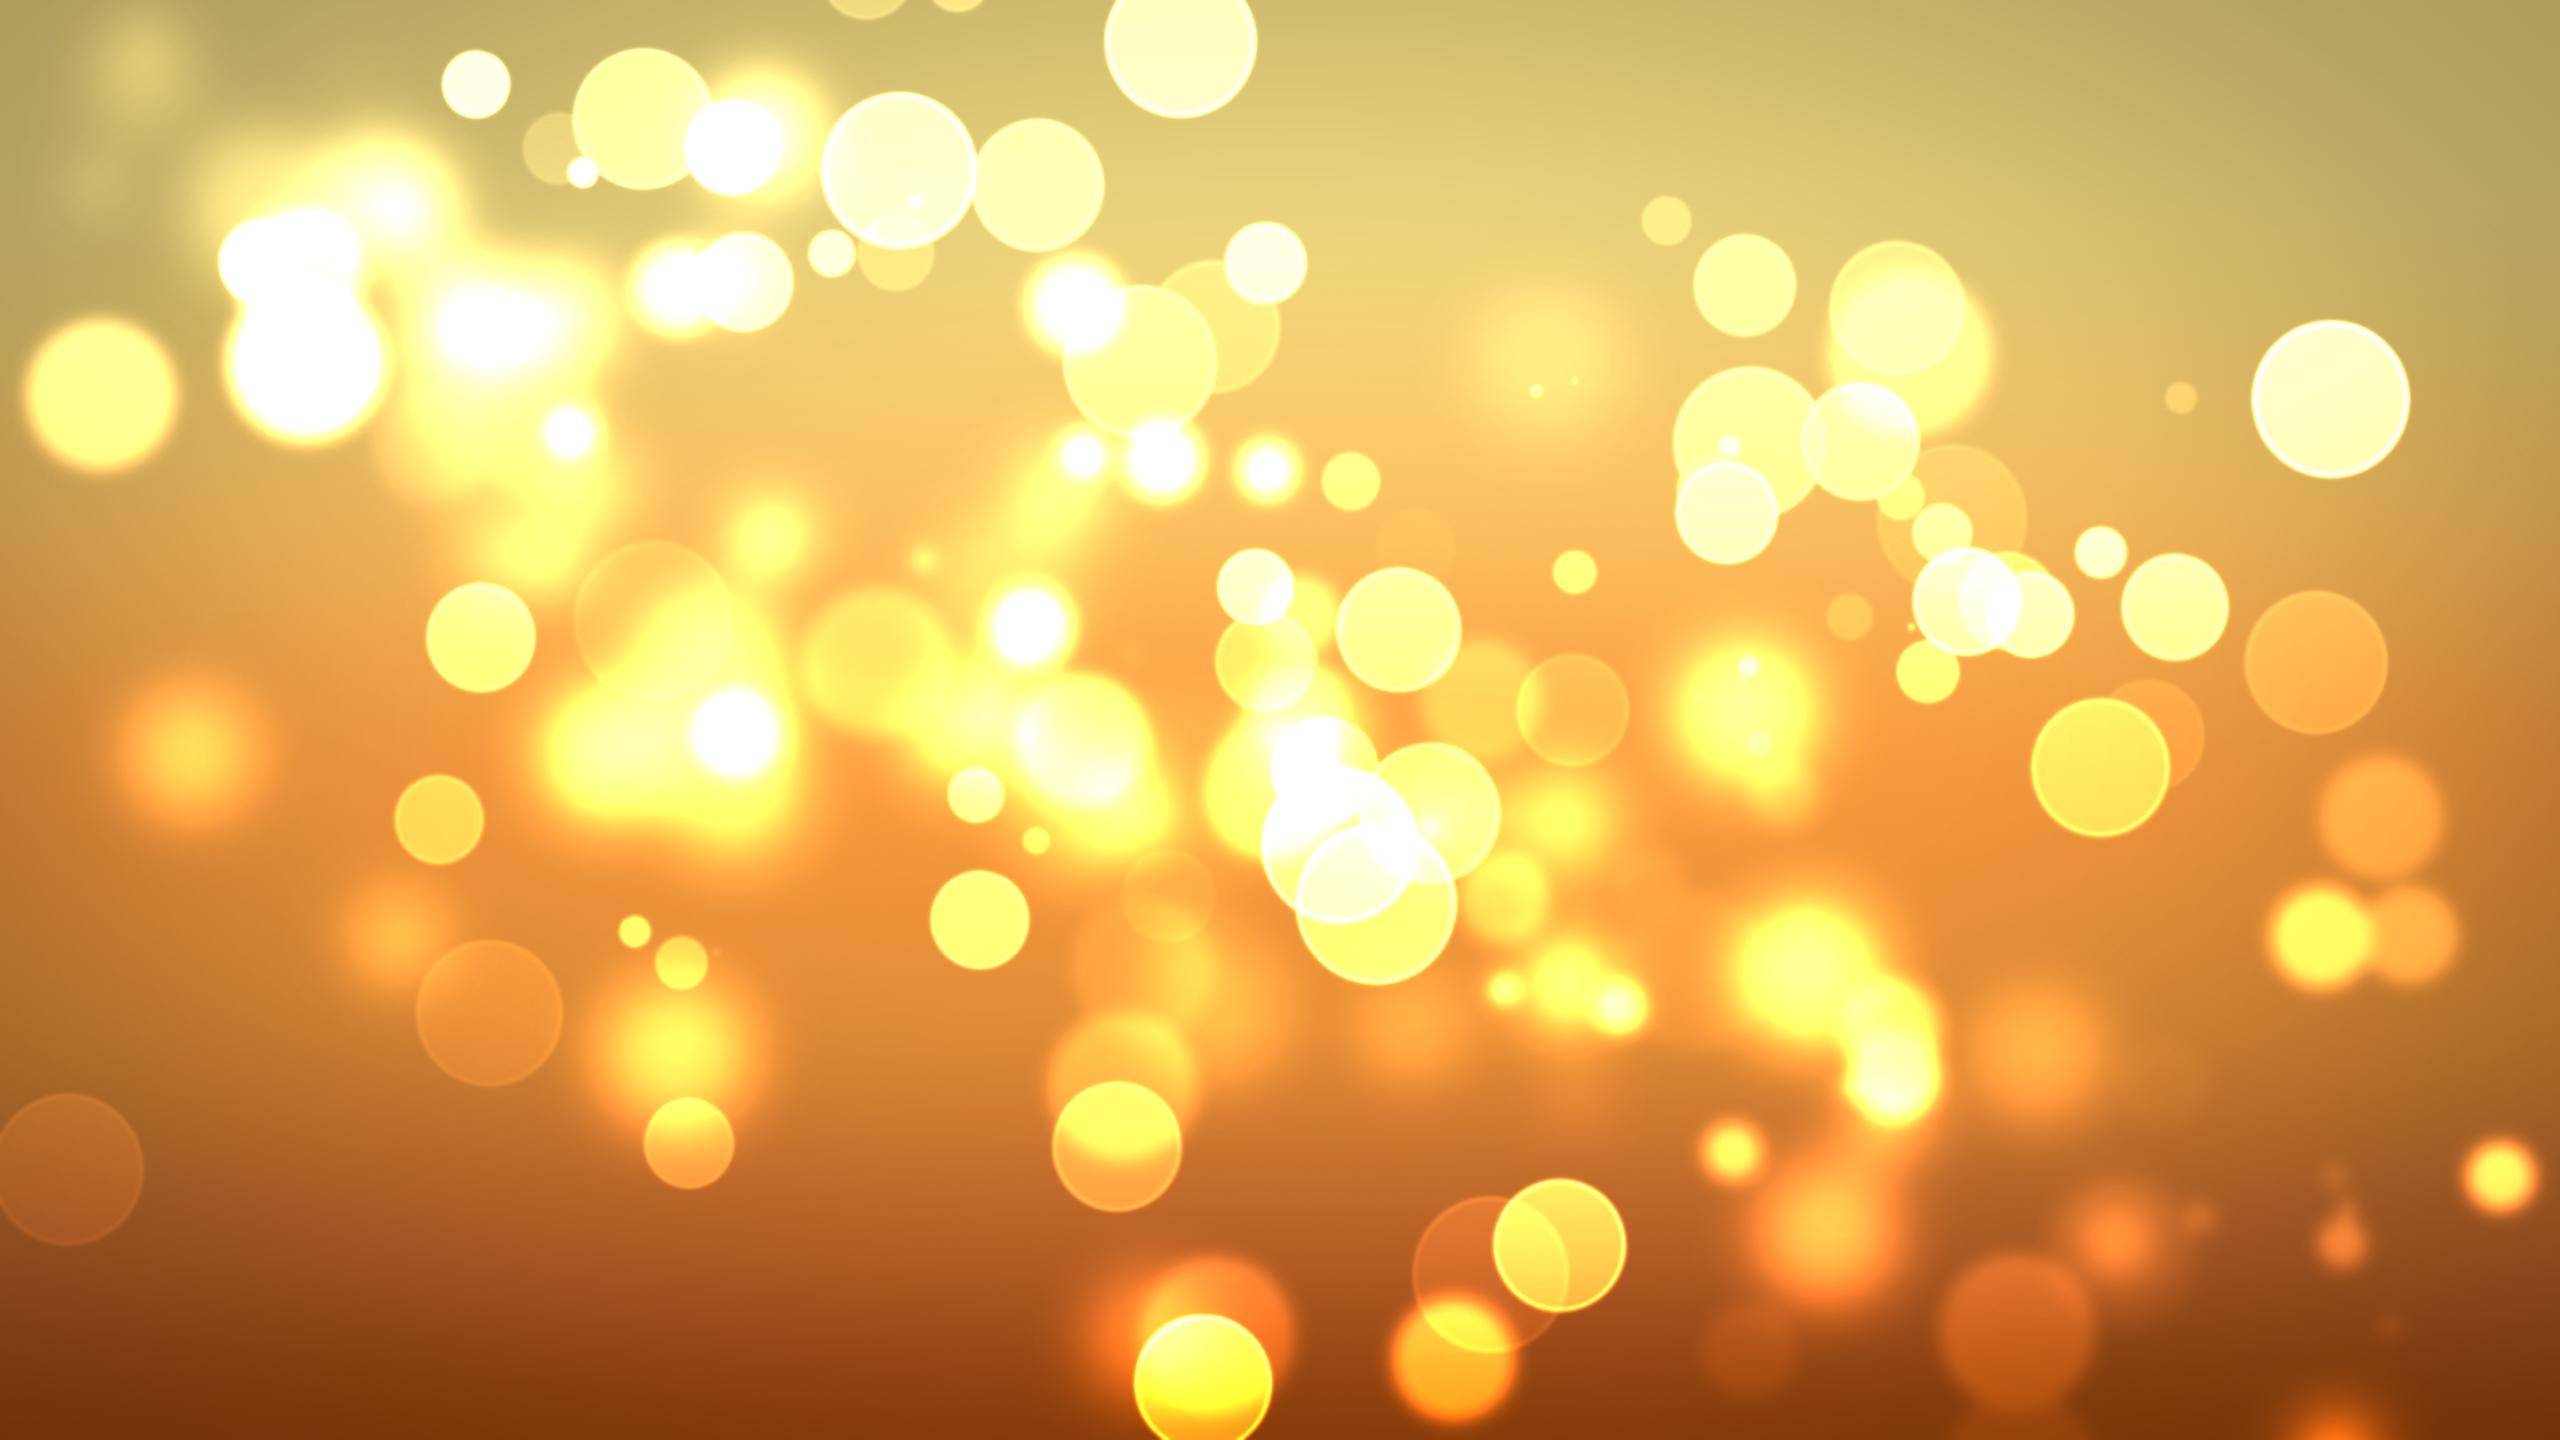 sunlight, illustration, yellow, circle ...